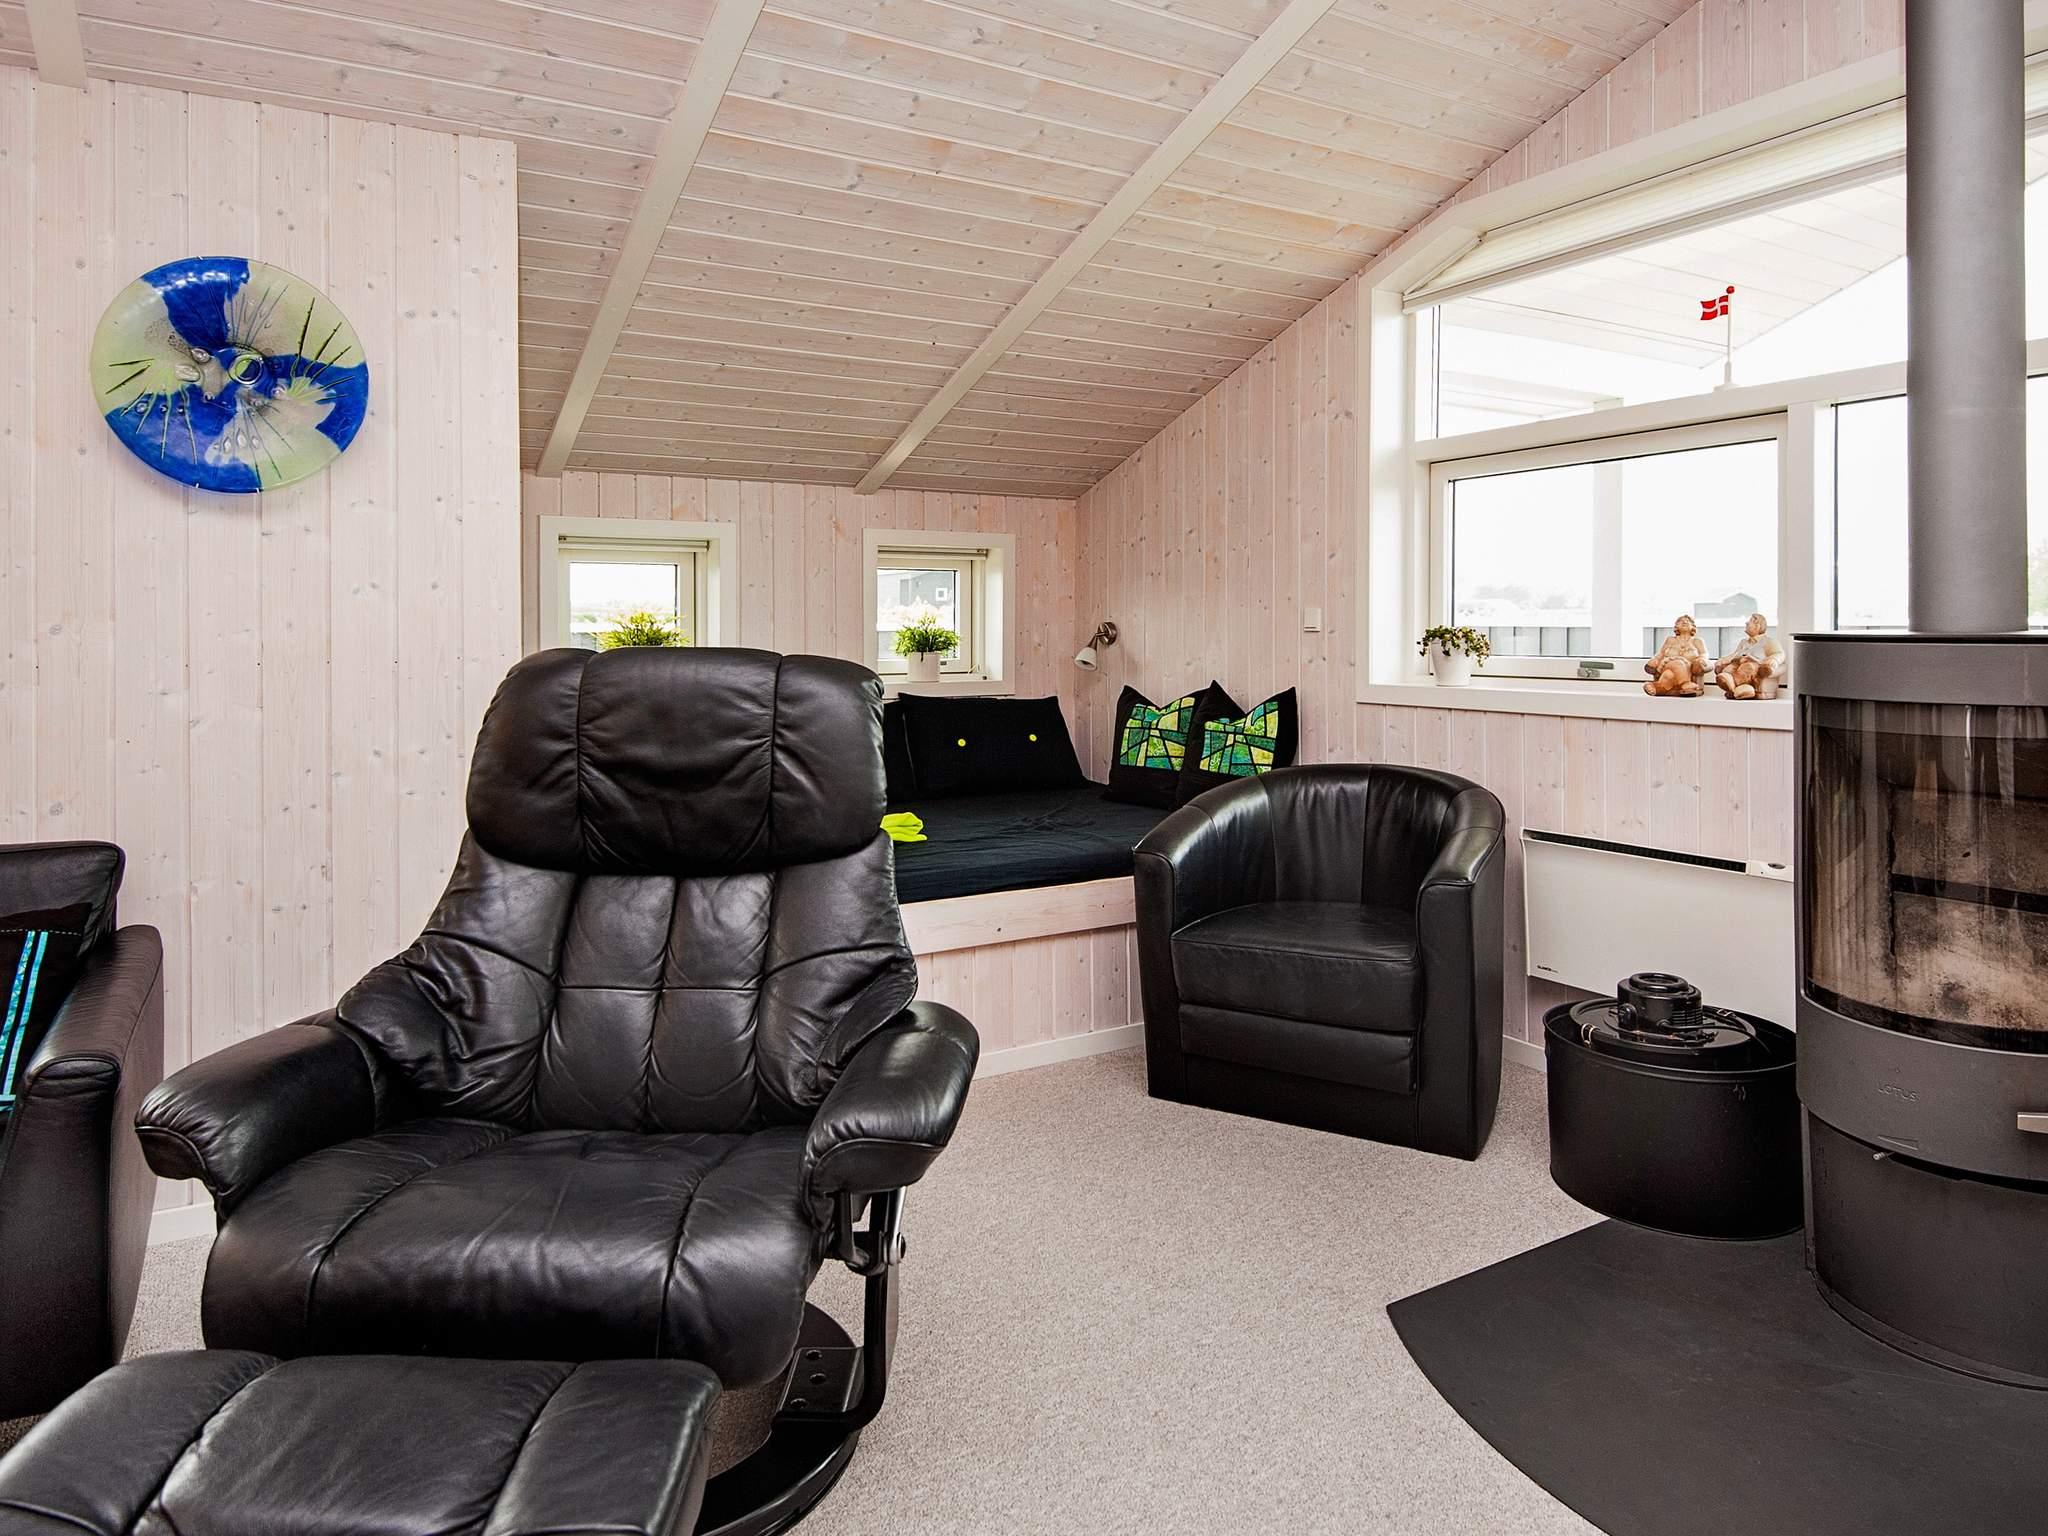 Ferienhaus Flovt Strand (379532), Flovt Strand, , Südostjütland, Dänemark, Bild 12